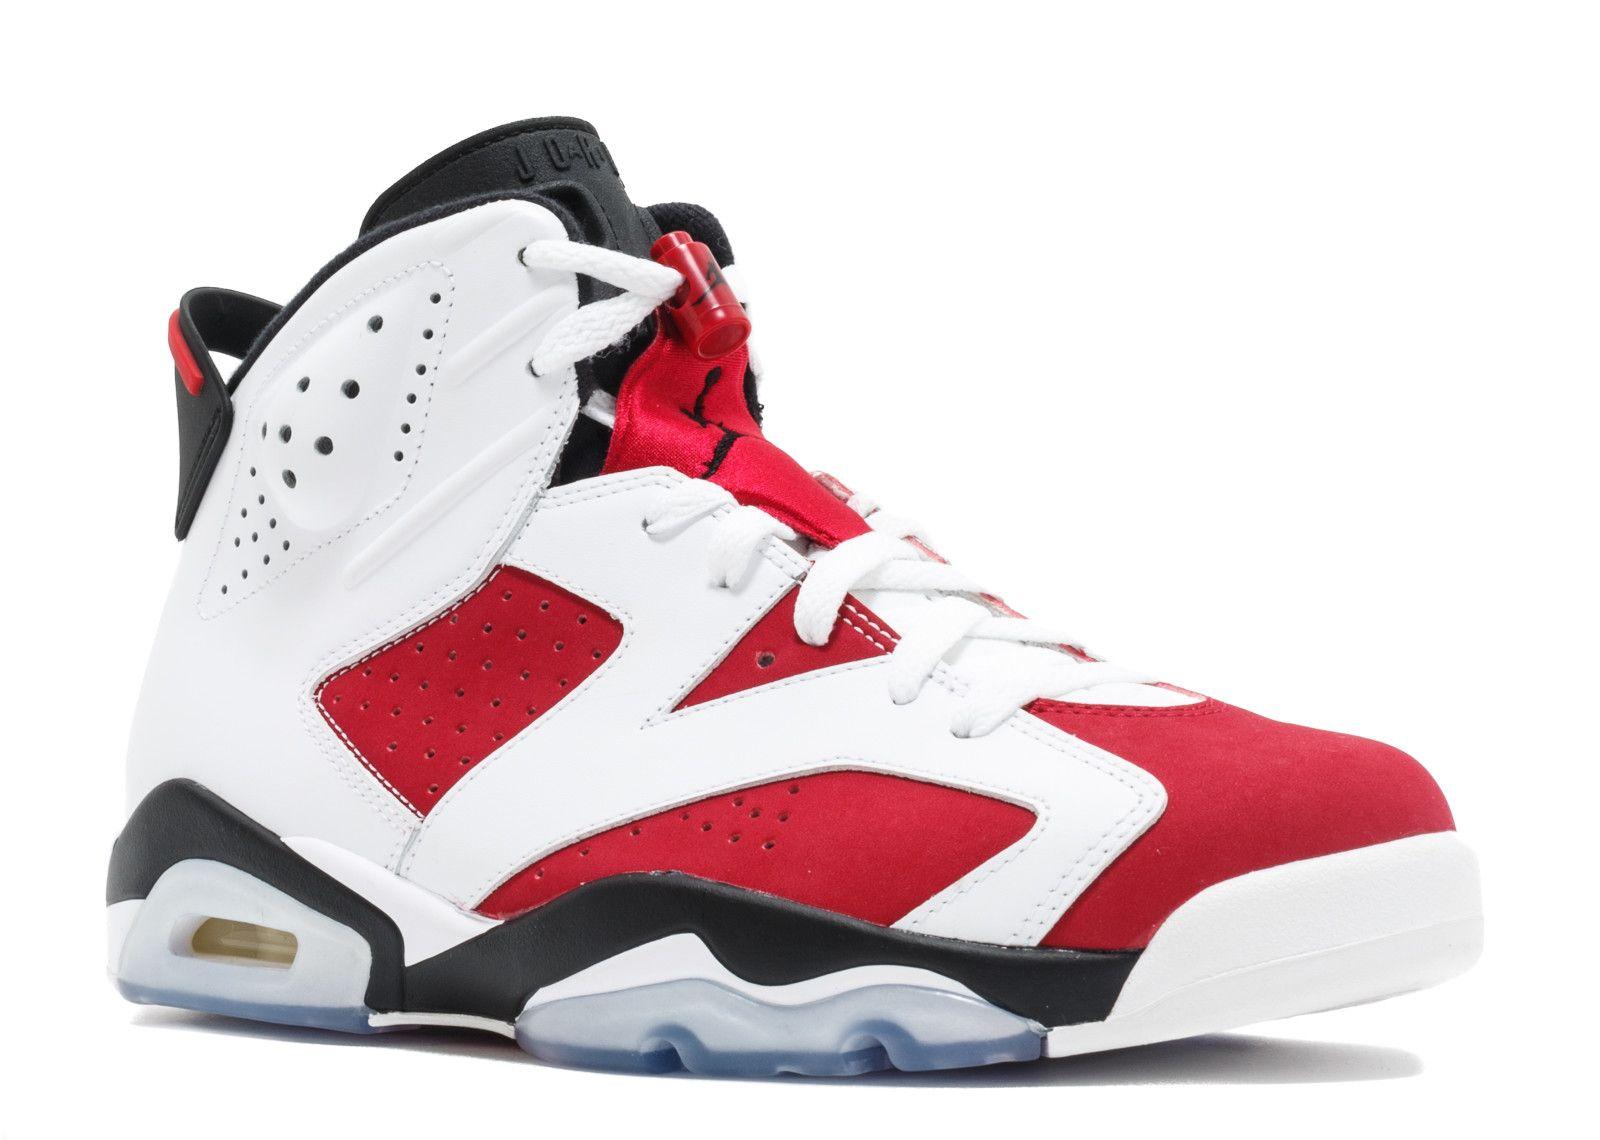 jordan shoes 6 carmines box countdown calendar 795686